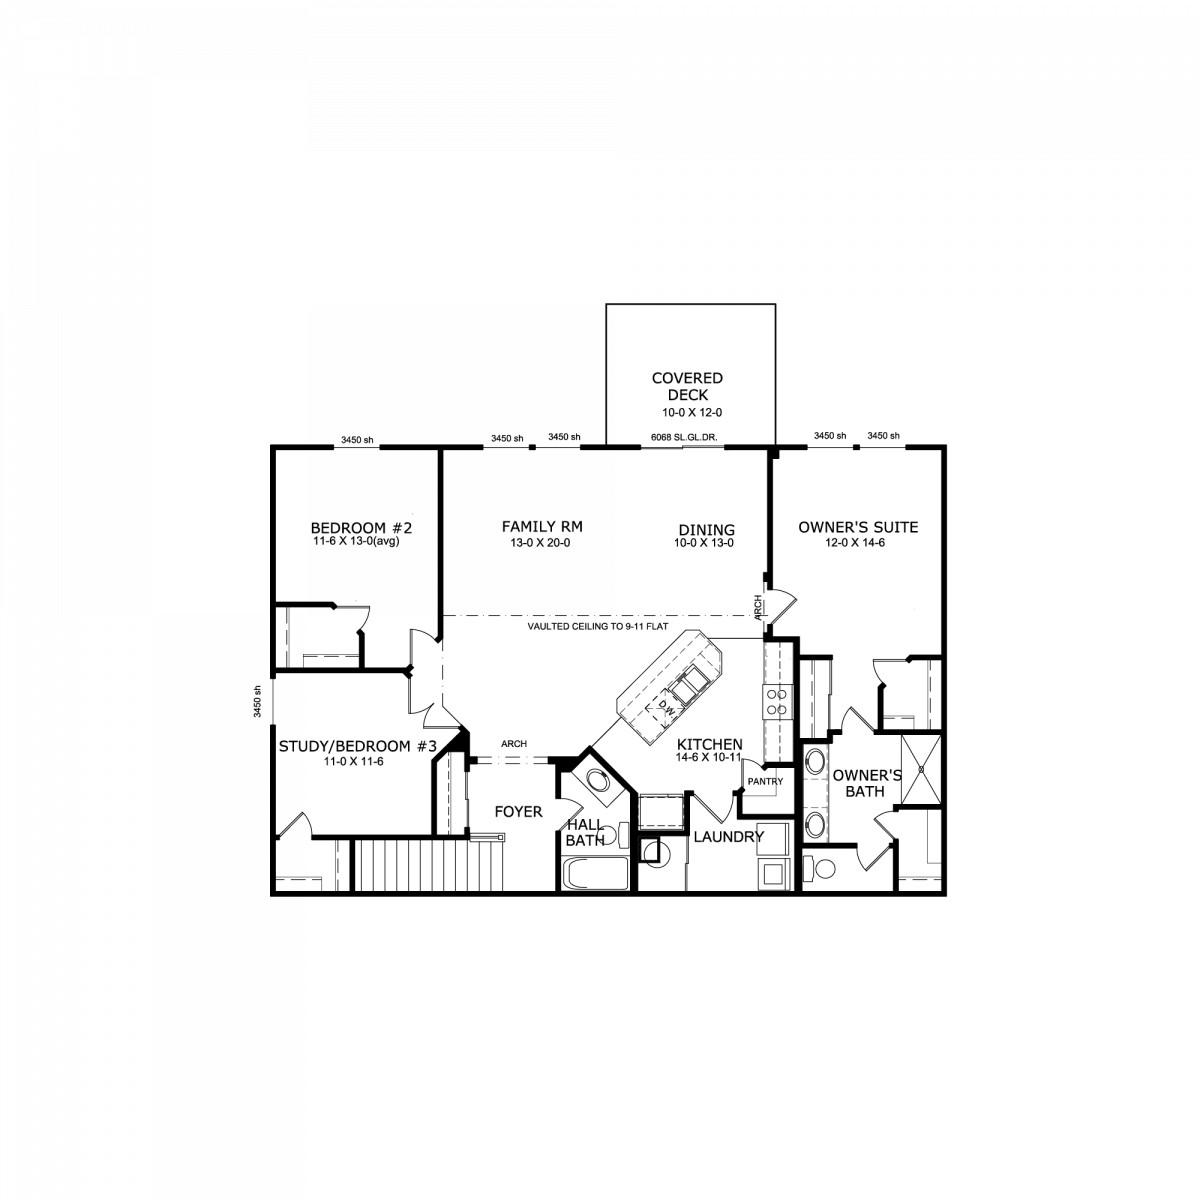 Hayward Plan At Twelve Oaks In Cincinnati Oh By Fischer Homes